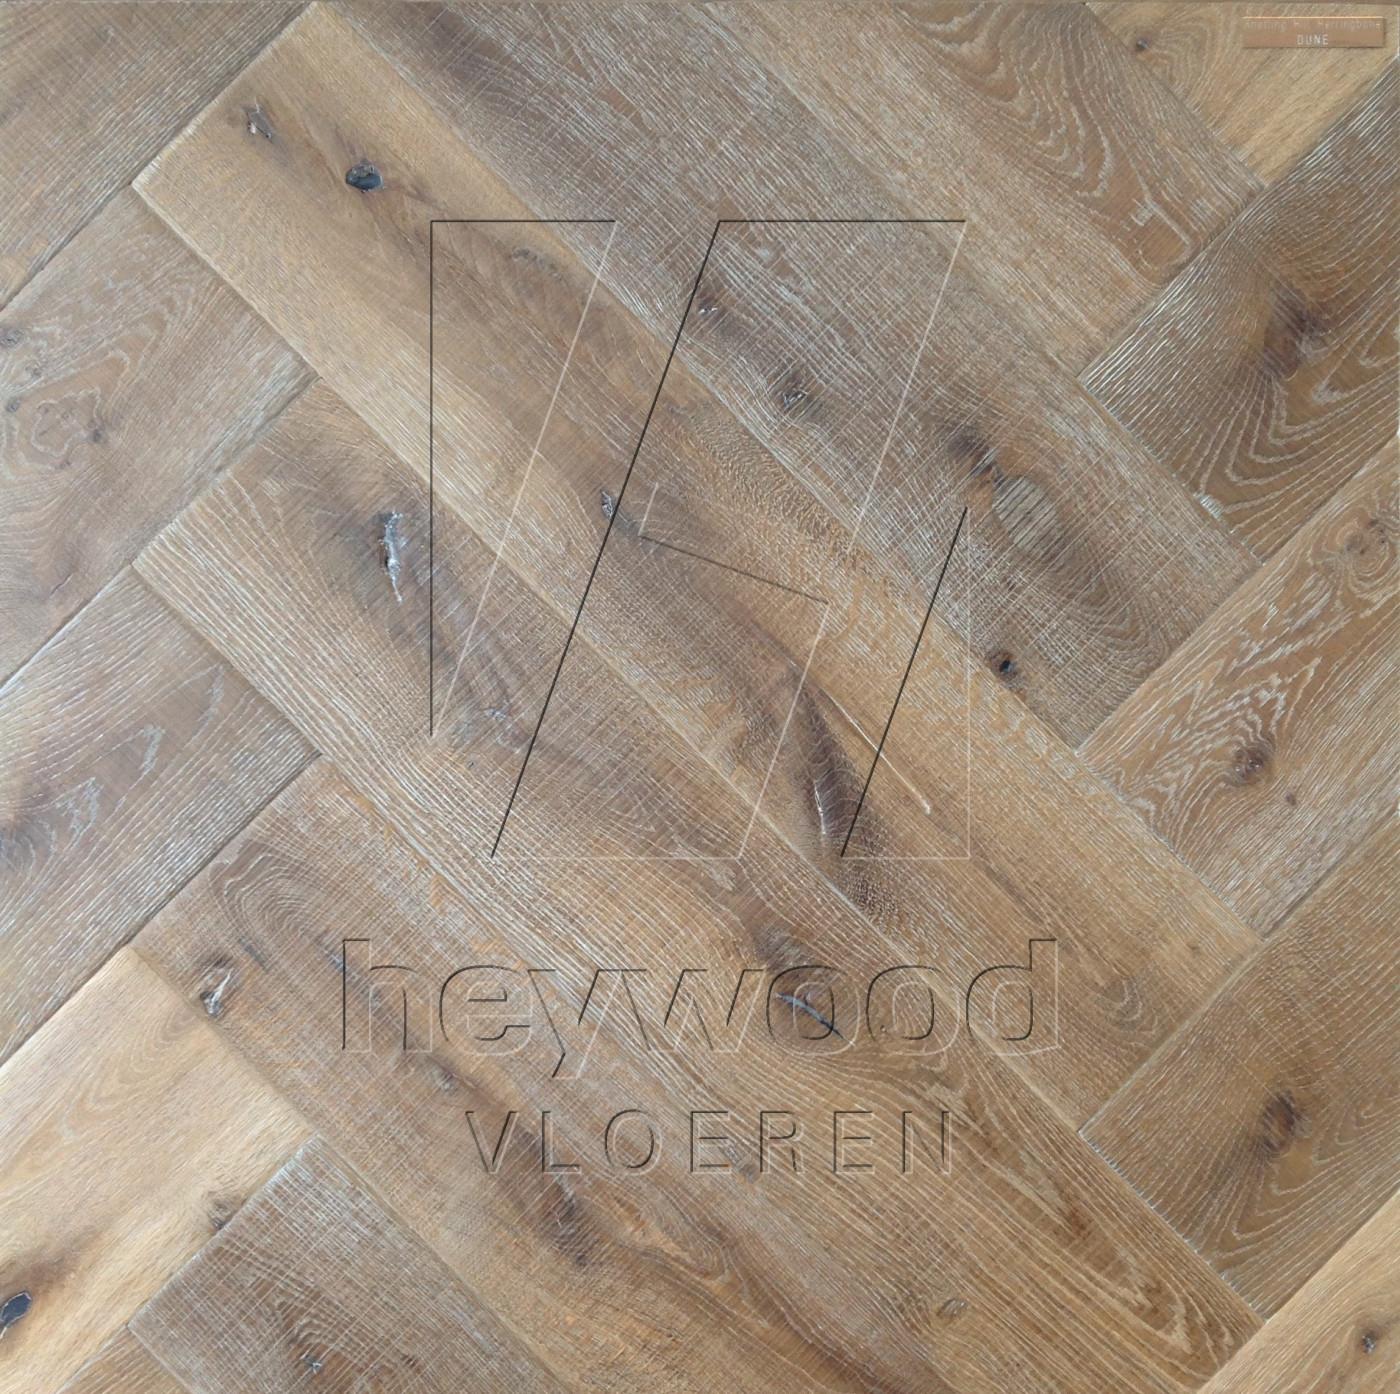 Knotting Hill 'Dune' 15/4 x 150 x 750 mm in Herringbone of Pattern & Panel Floors